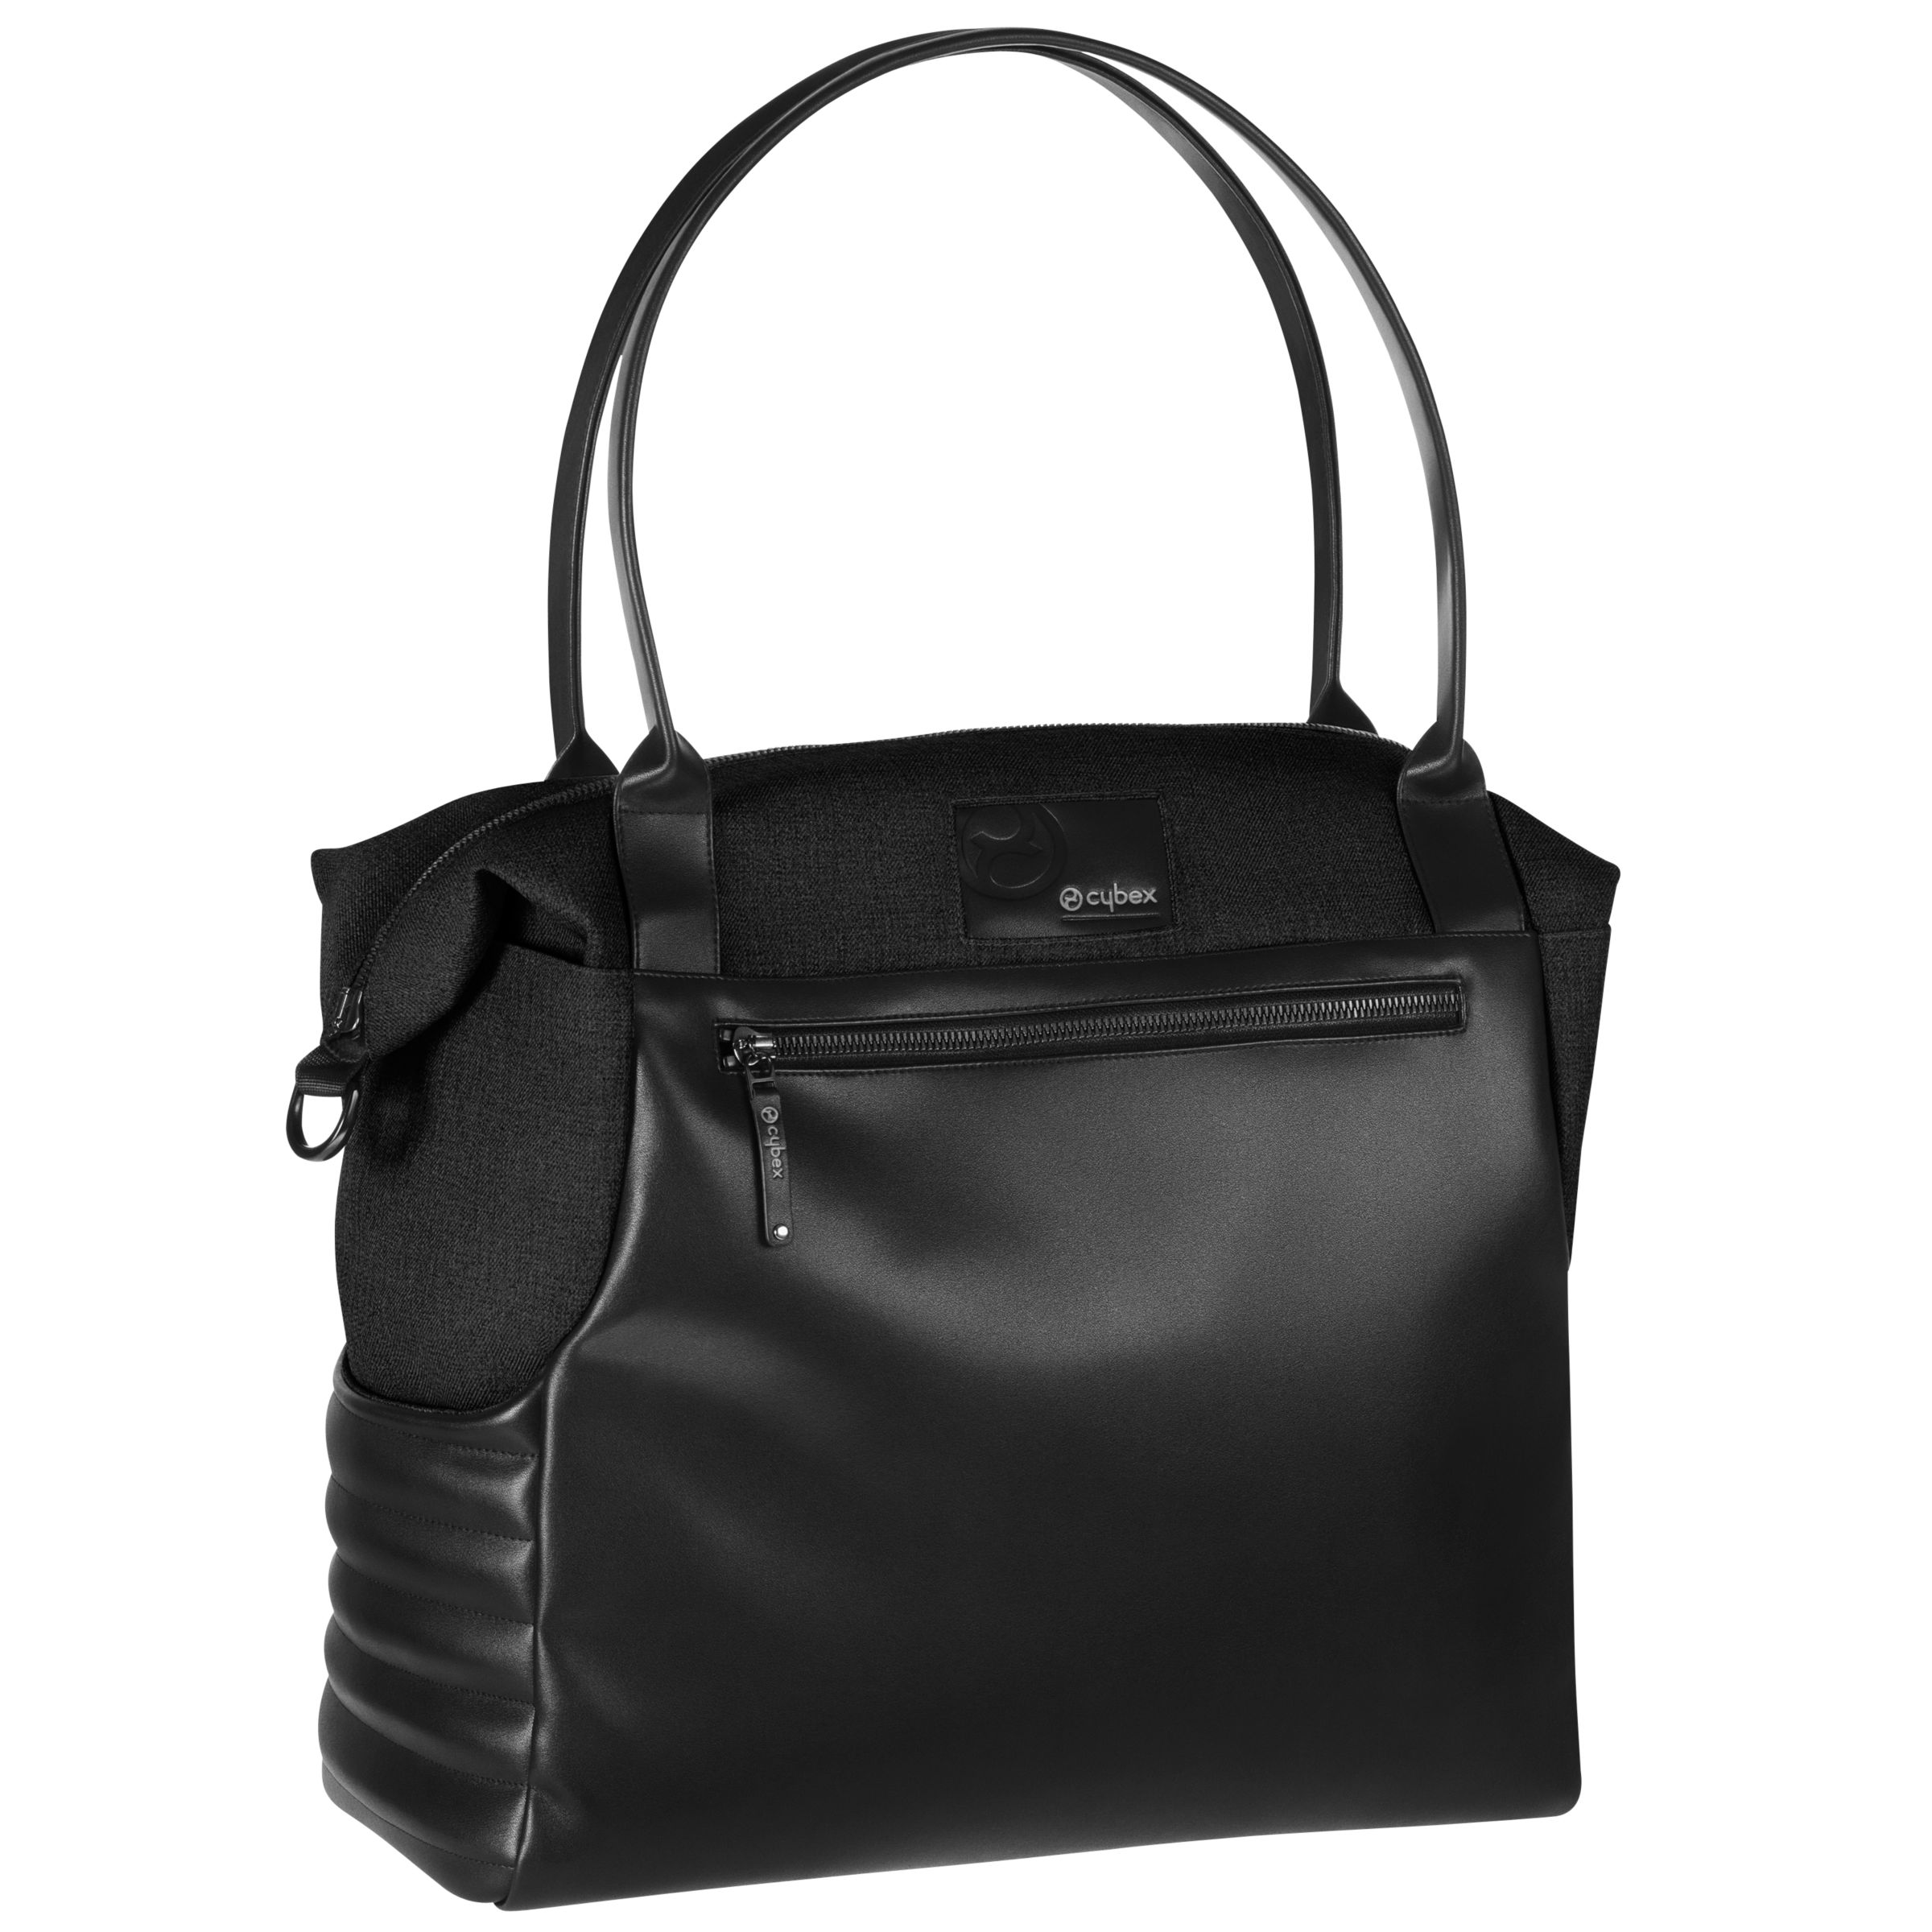 Cybex Cybex Priam Changing Bag, Black